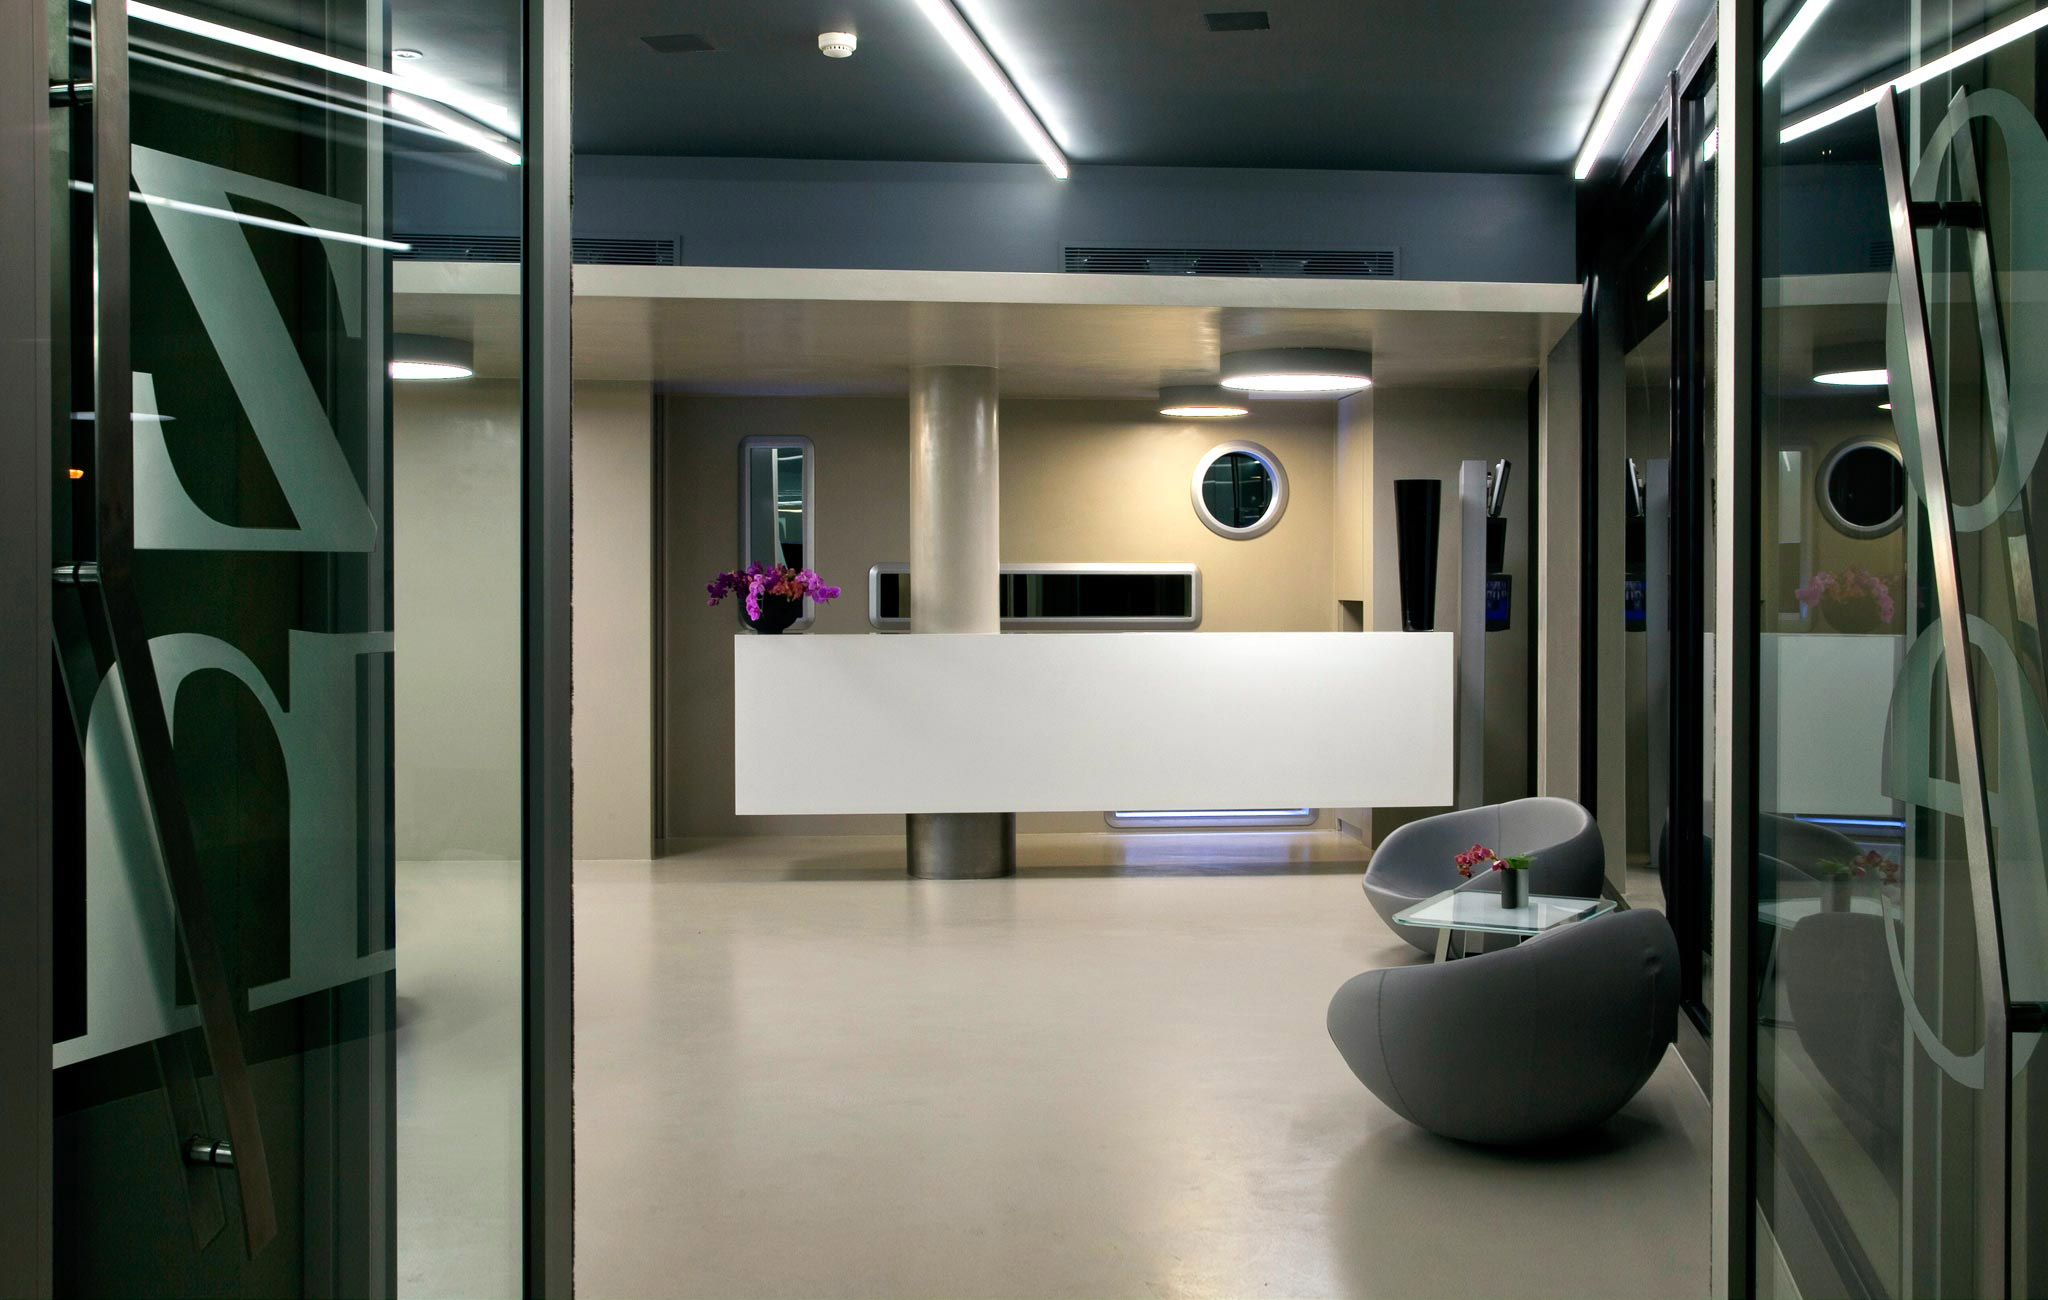 hotel zone rome transat. Black Bedroom Furniture Sets. Home Design Ideas